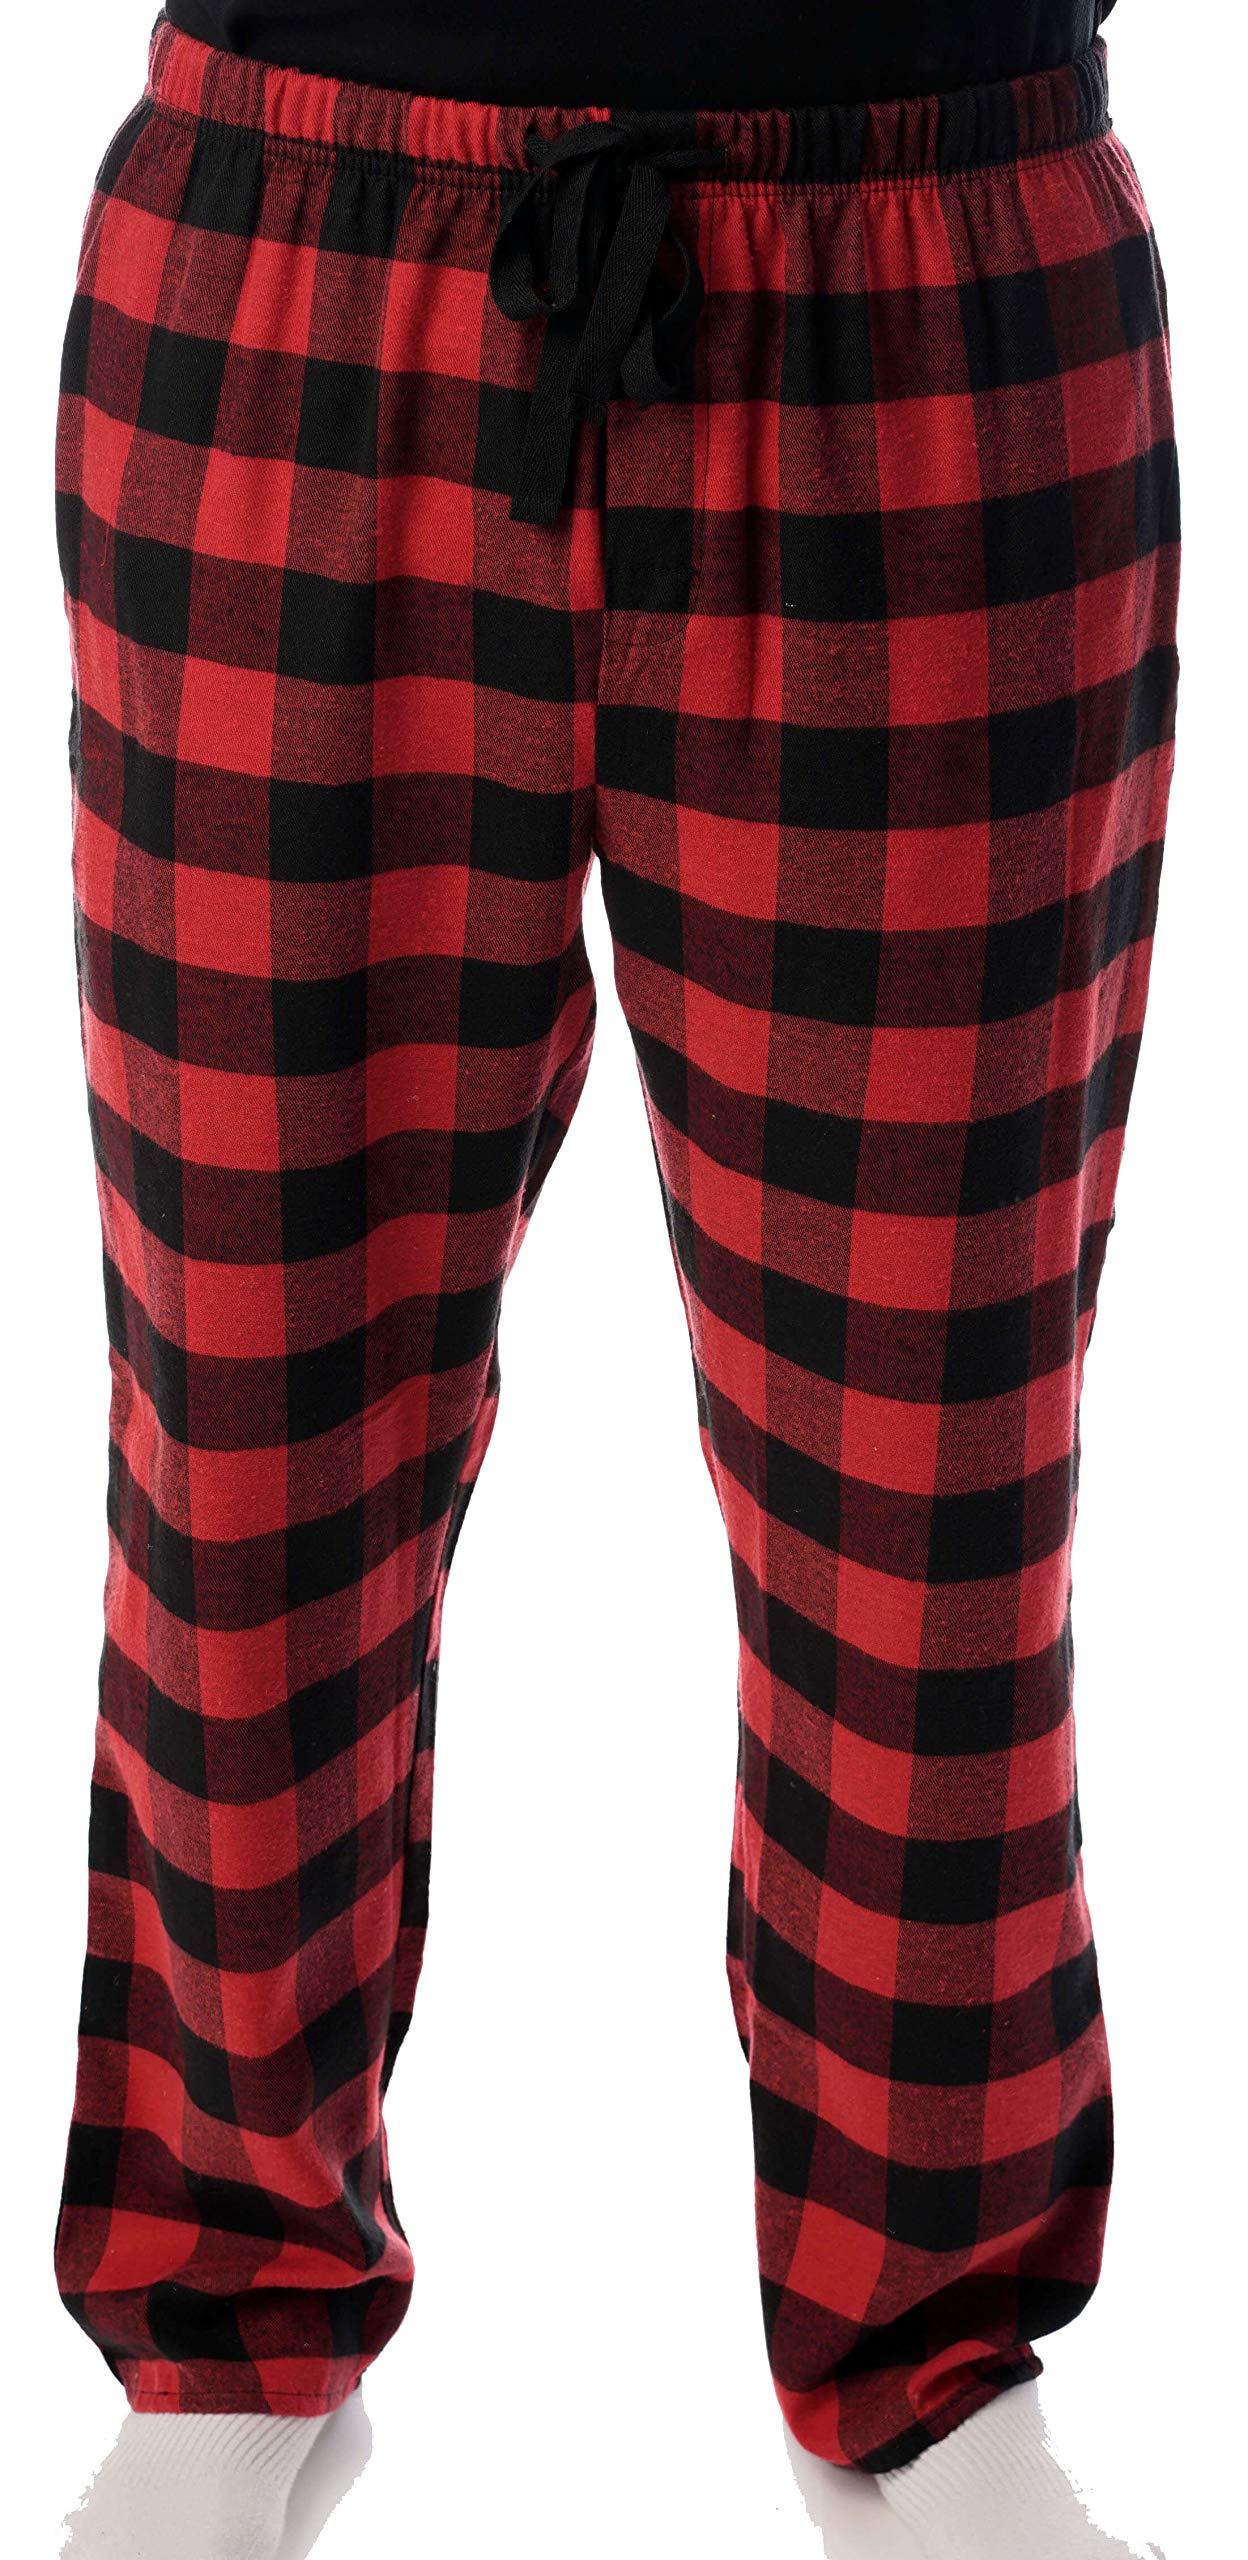 45905-1A-L #followme Mens Flannel Pajama Pants Mens Pajamas by #followme